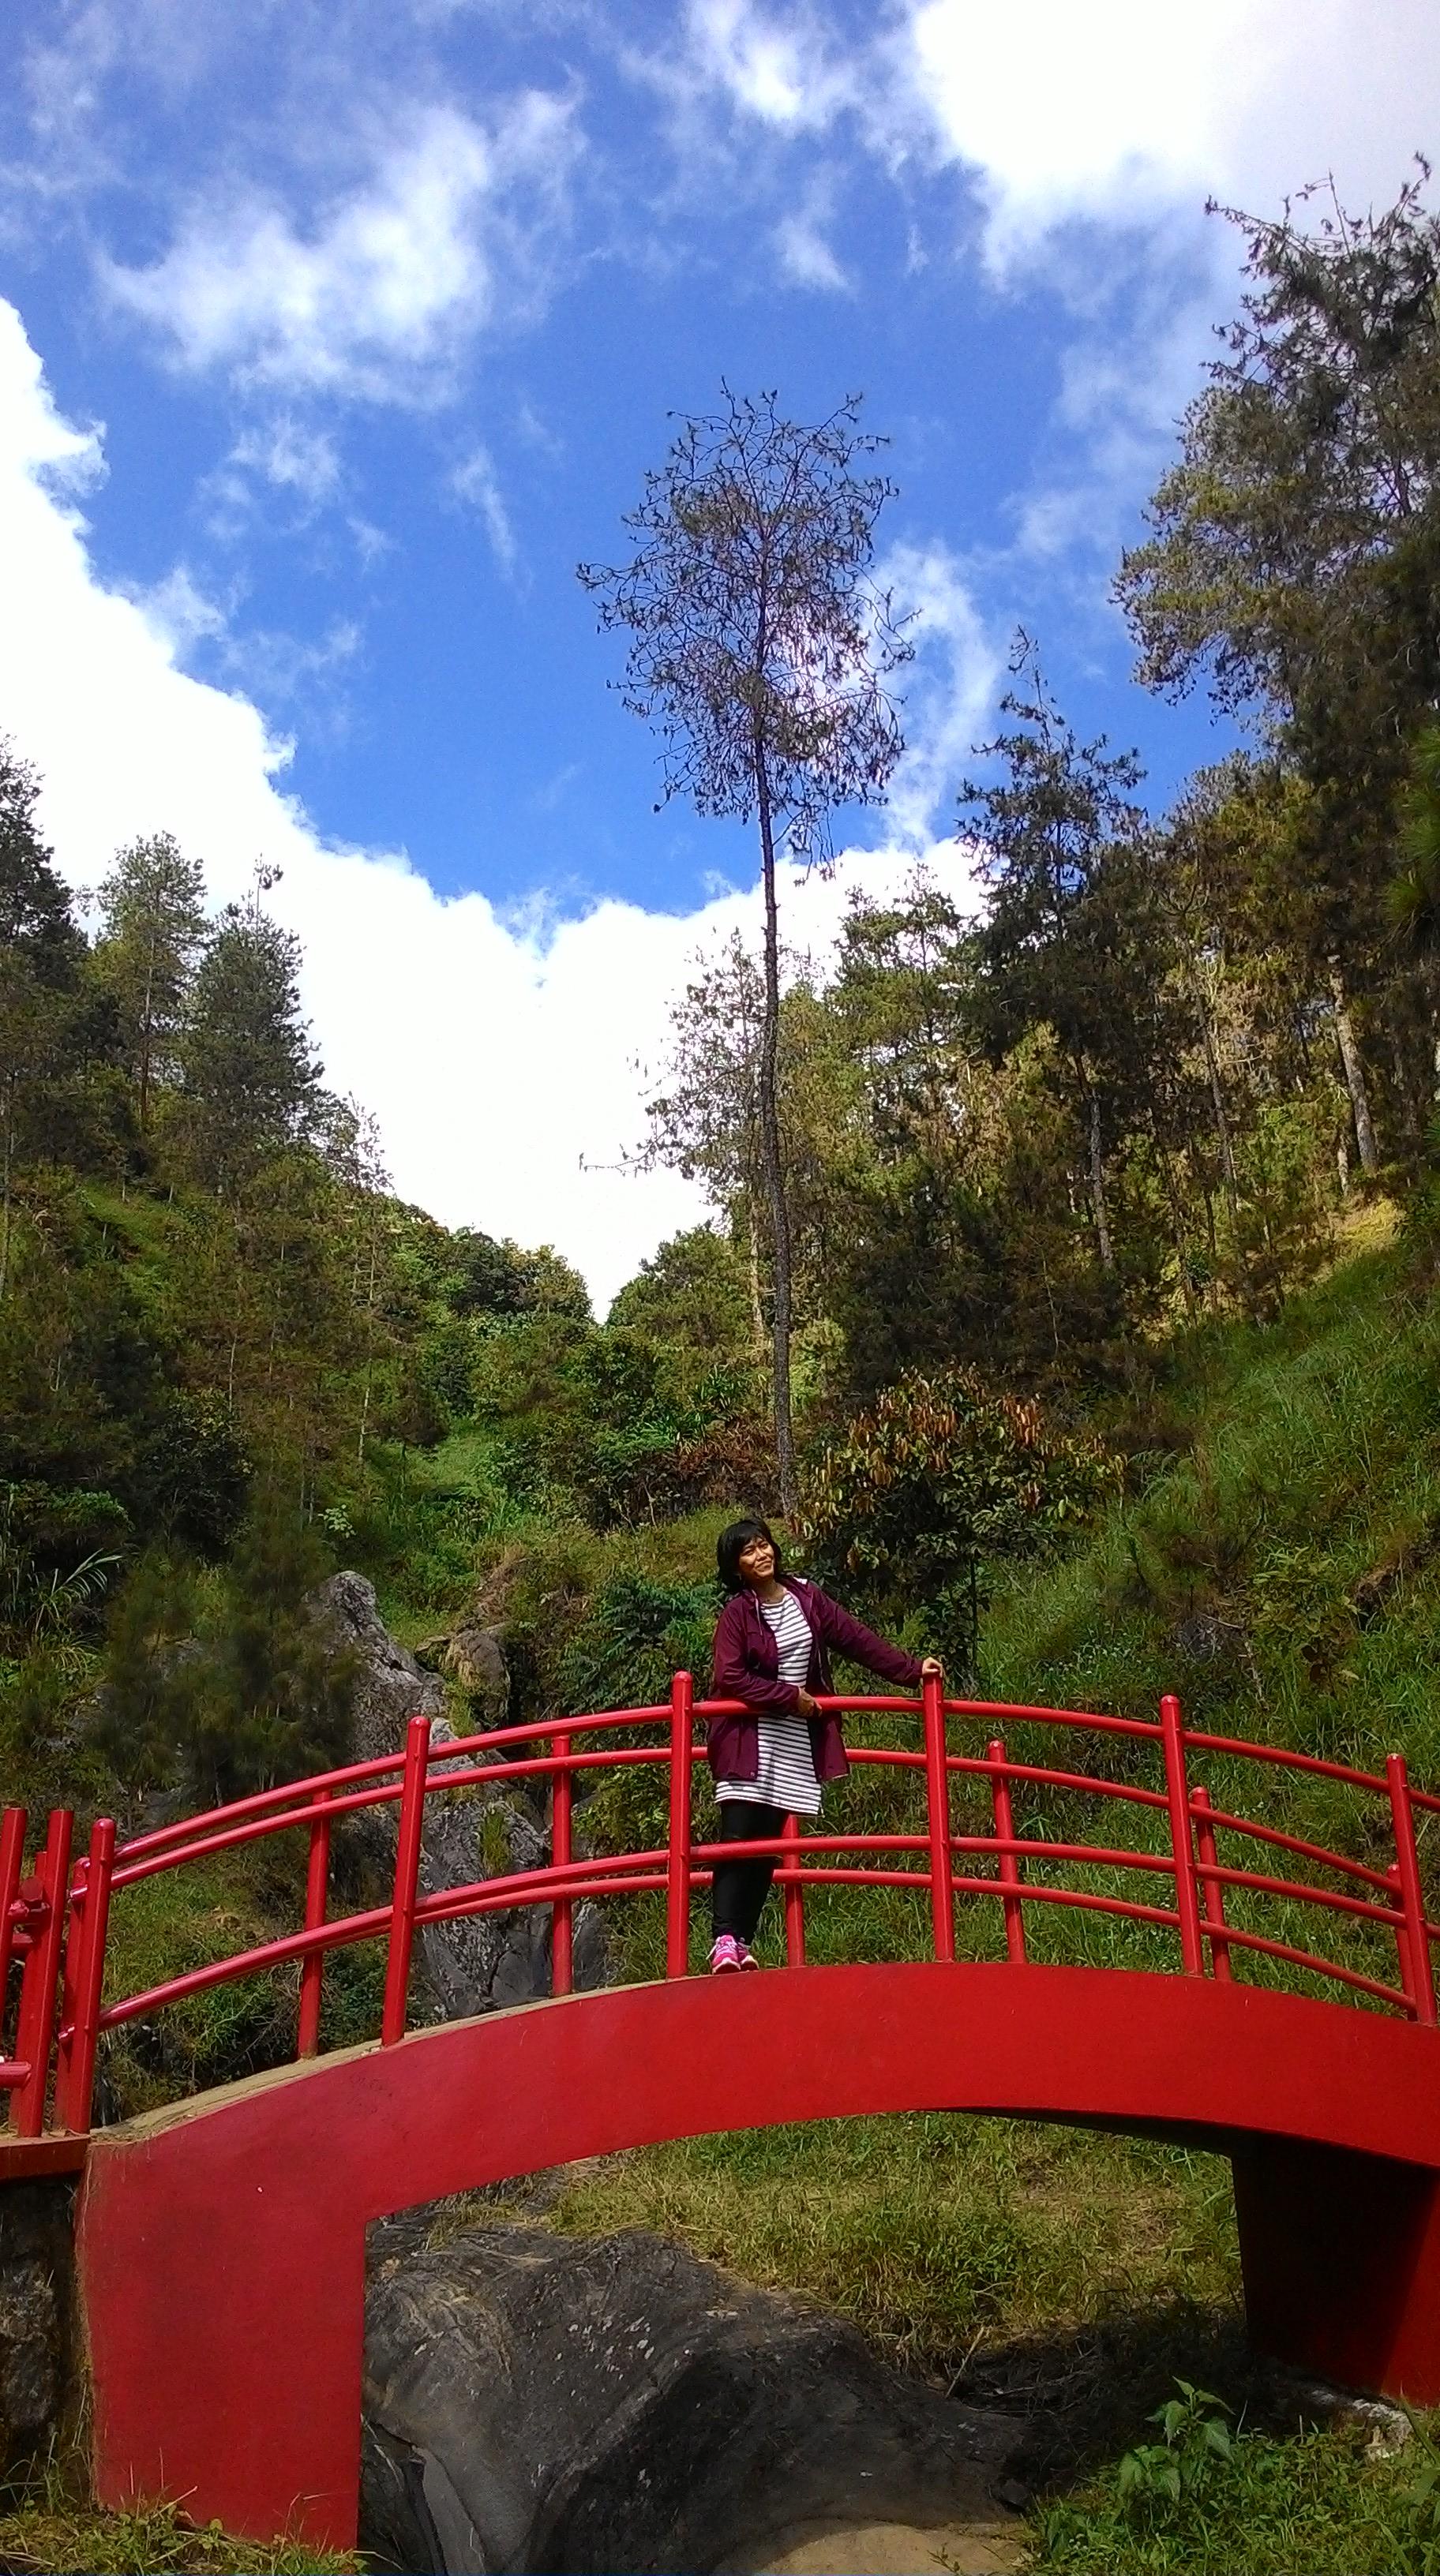 Menghindarijakarta Bermain Seharian Karanganyar Bella Zoditama Jembatan Merah Taman Hutan